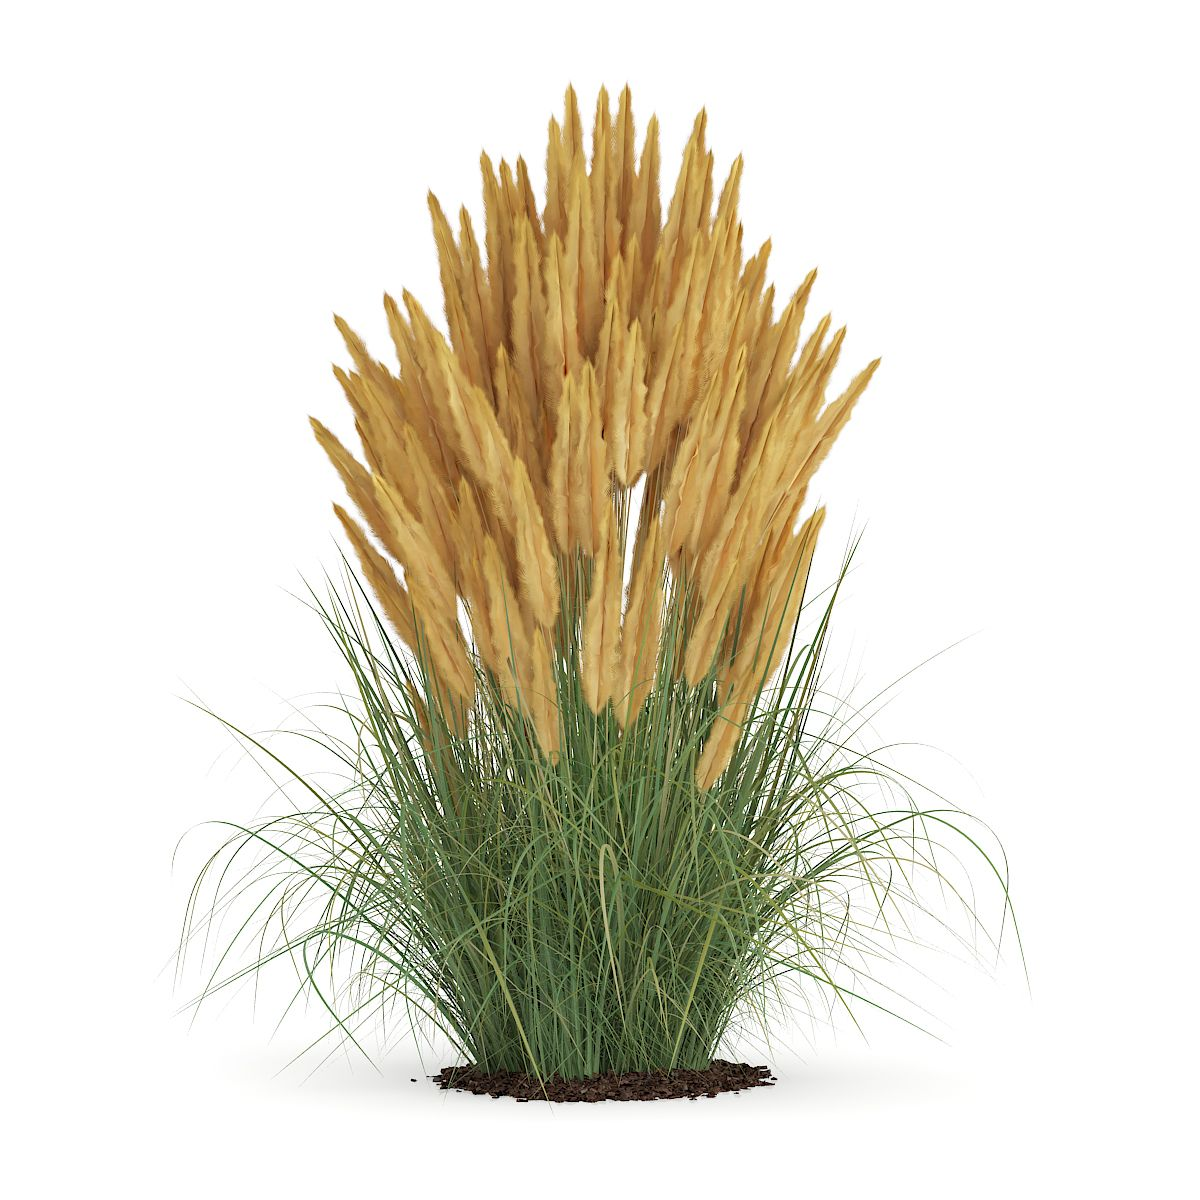 Ornamental Grass Ornamental Grasses Tree Photoshop Grasses Landscaping